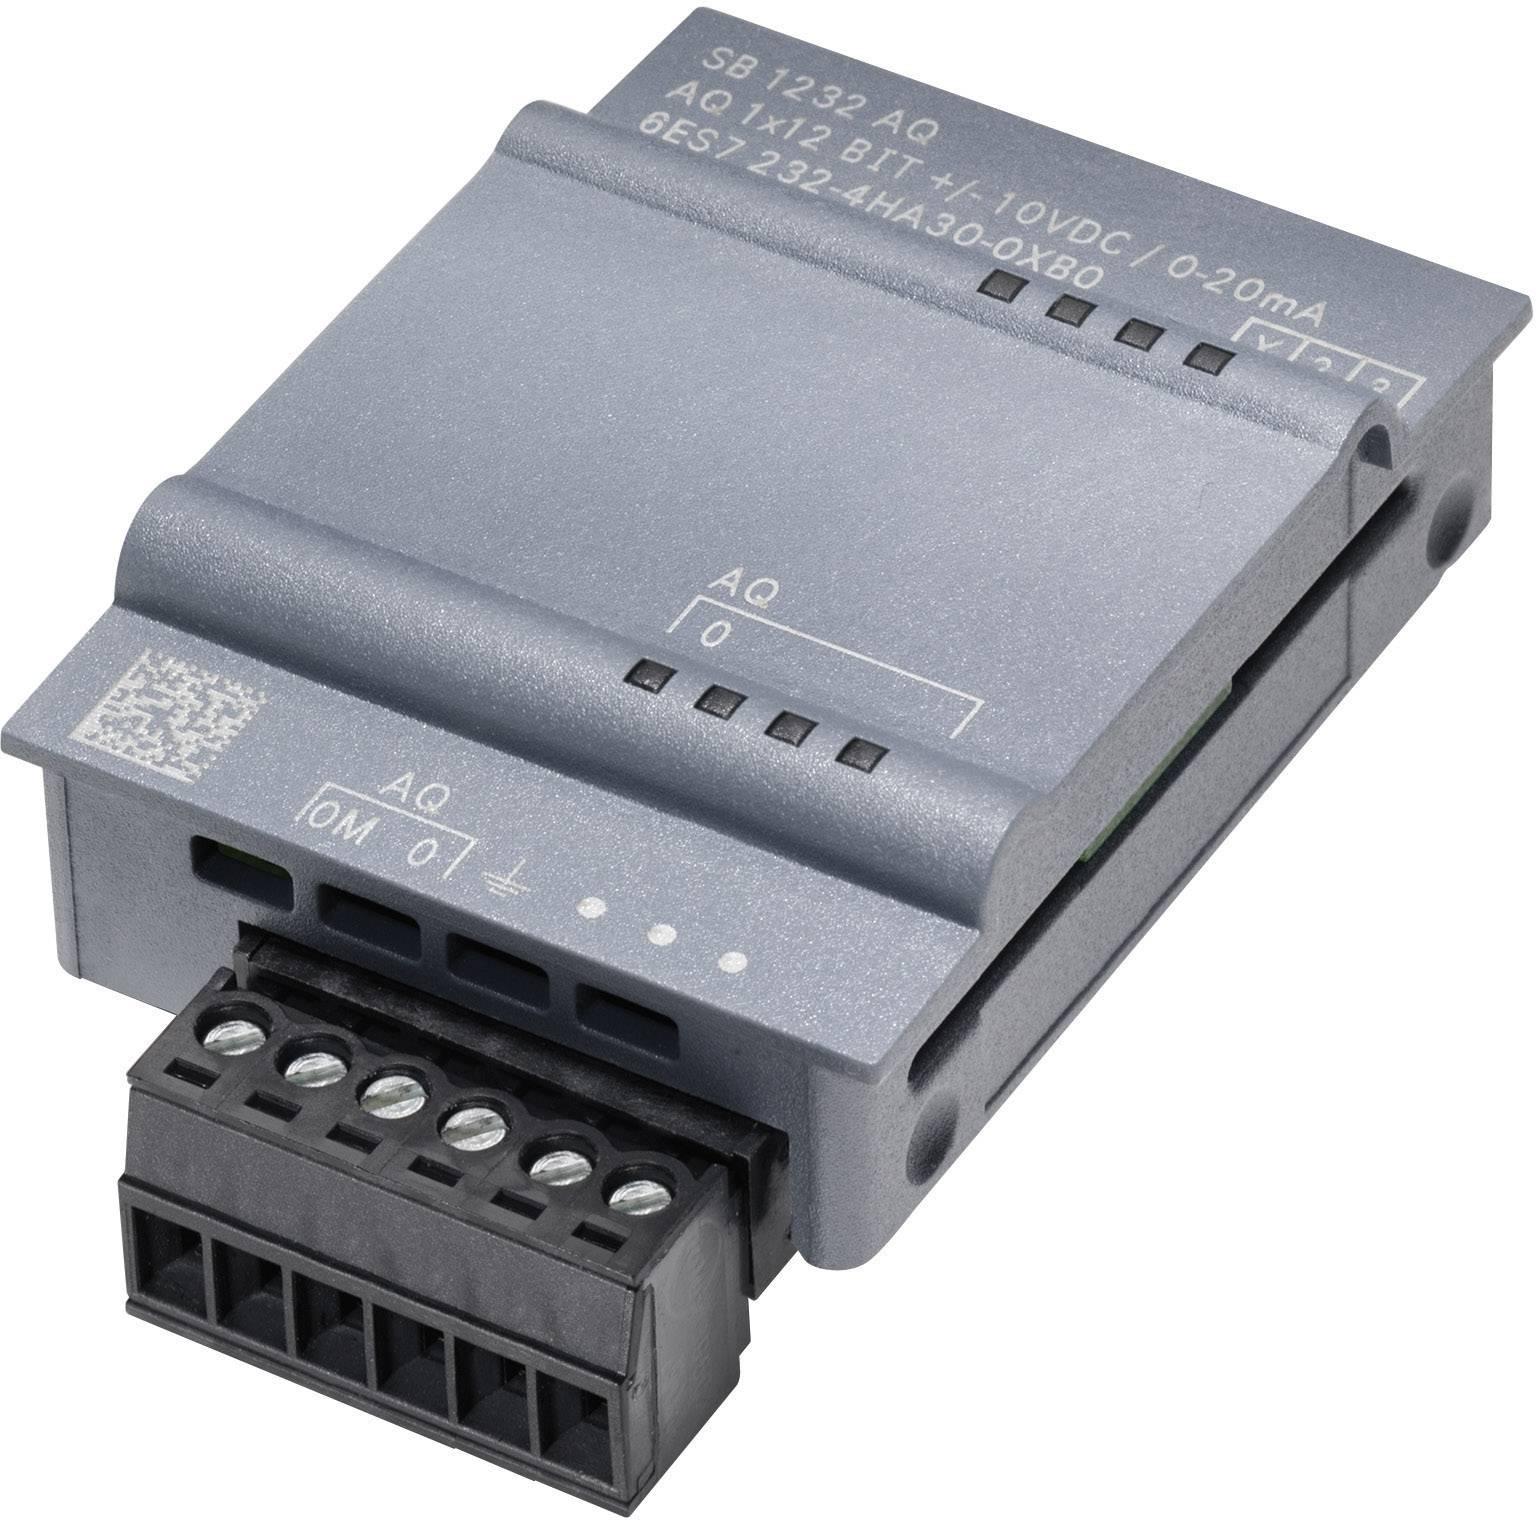 PLC rozširujúci modul Siemens SB 1232 6ES7232-4HA30-0XB0